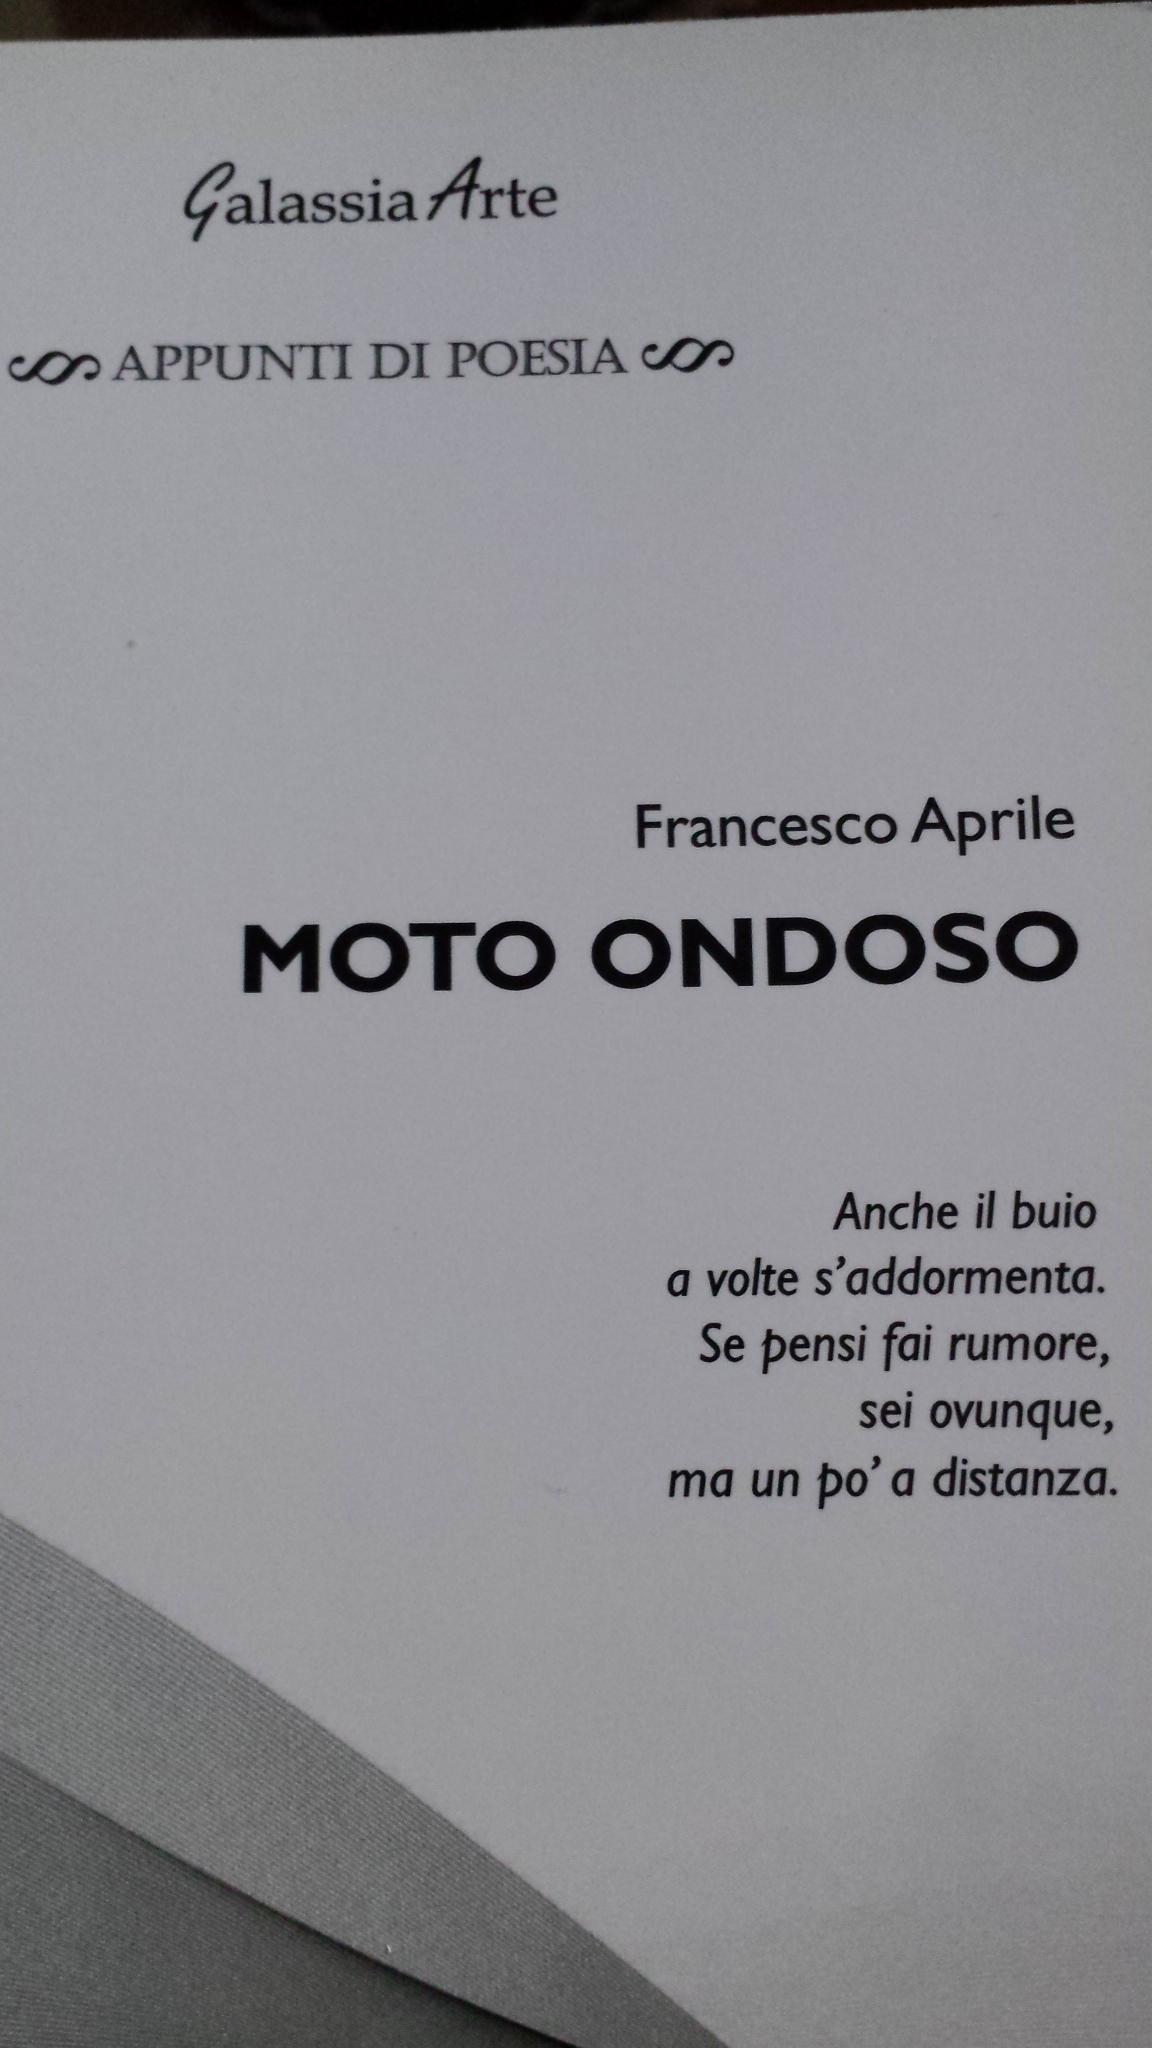 Moto ondoso Francesco Aprile